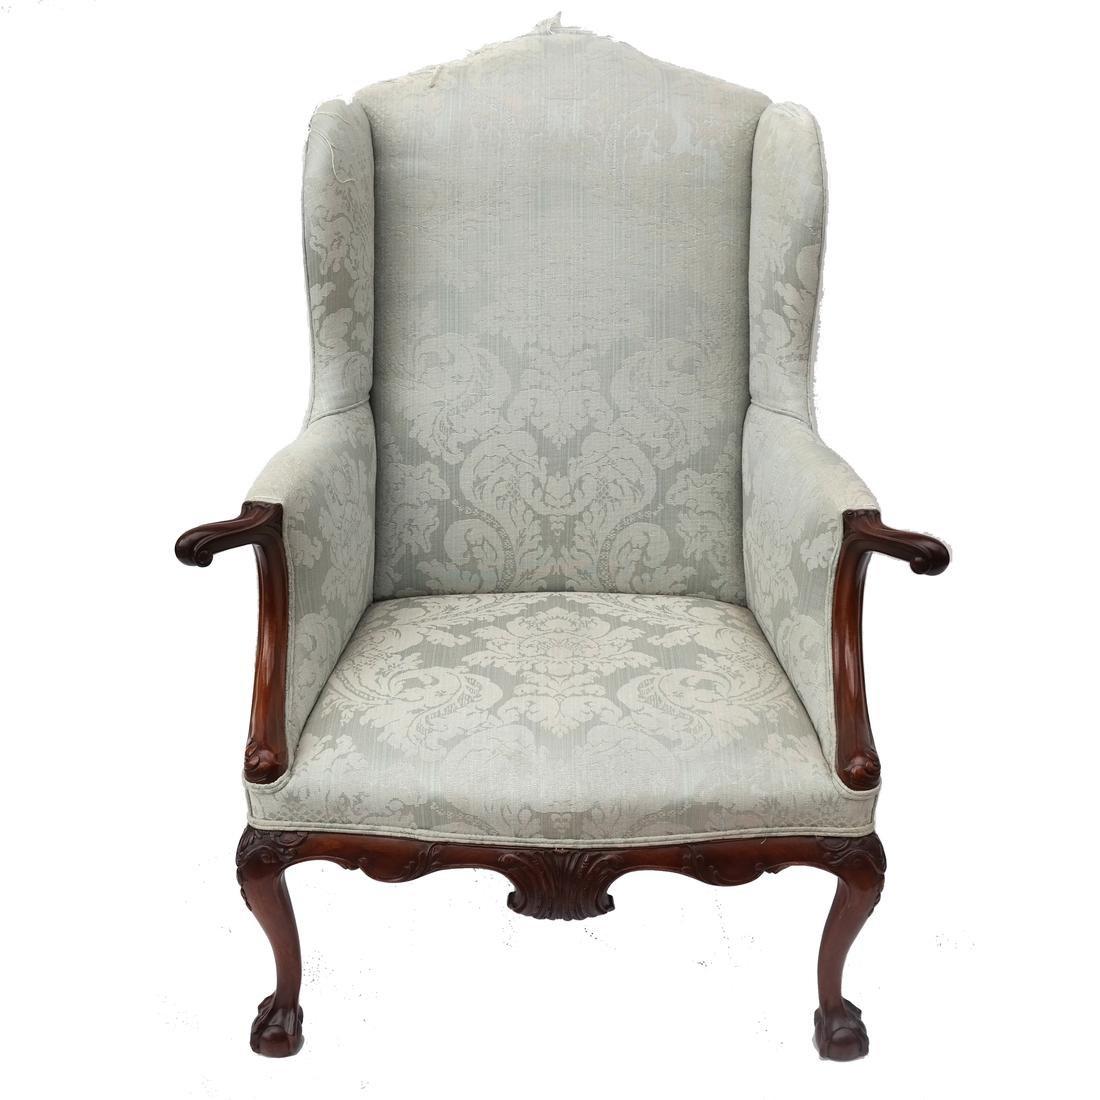 Irish Ball & Claw Wing Chair 19th Century